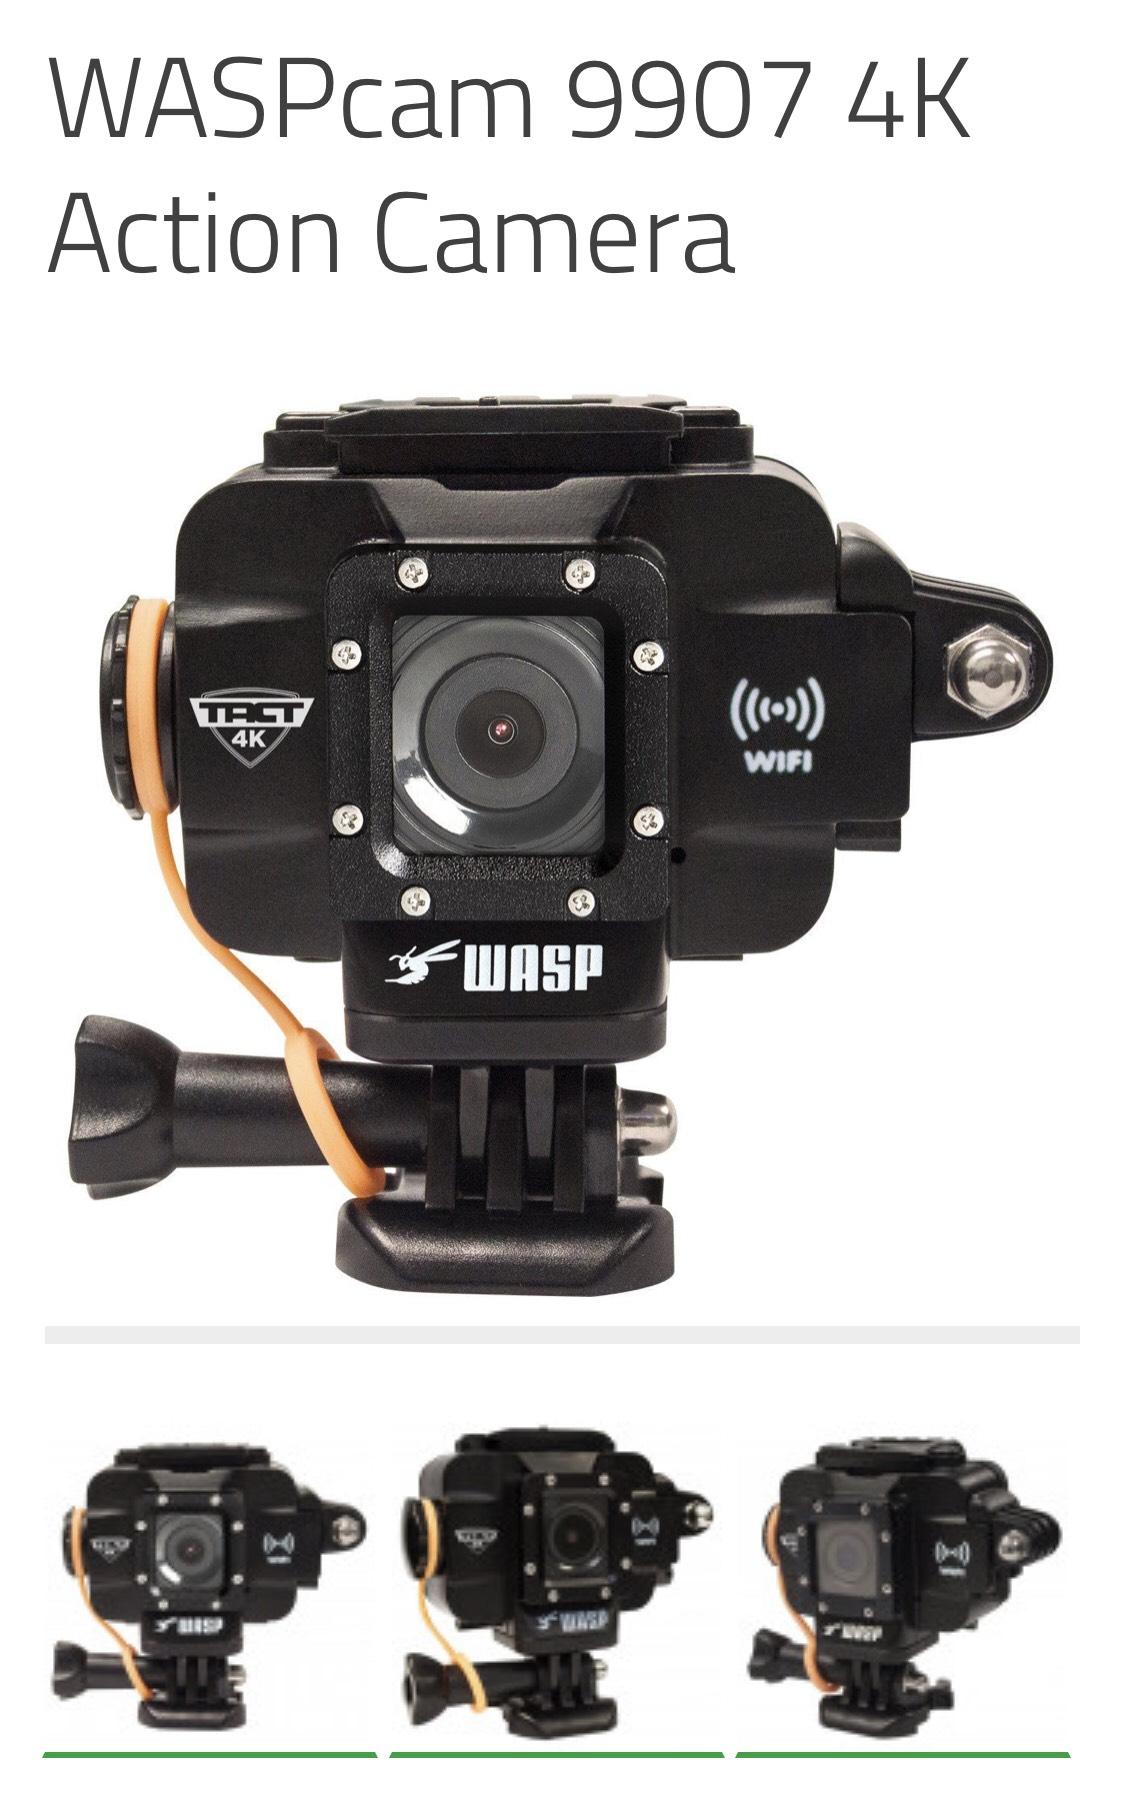 WASPcam 9907 4K Action Camera WiFi - £79.99 @ Snooper